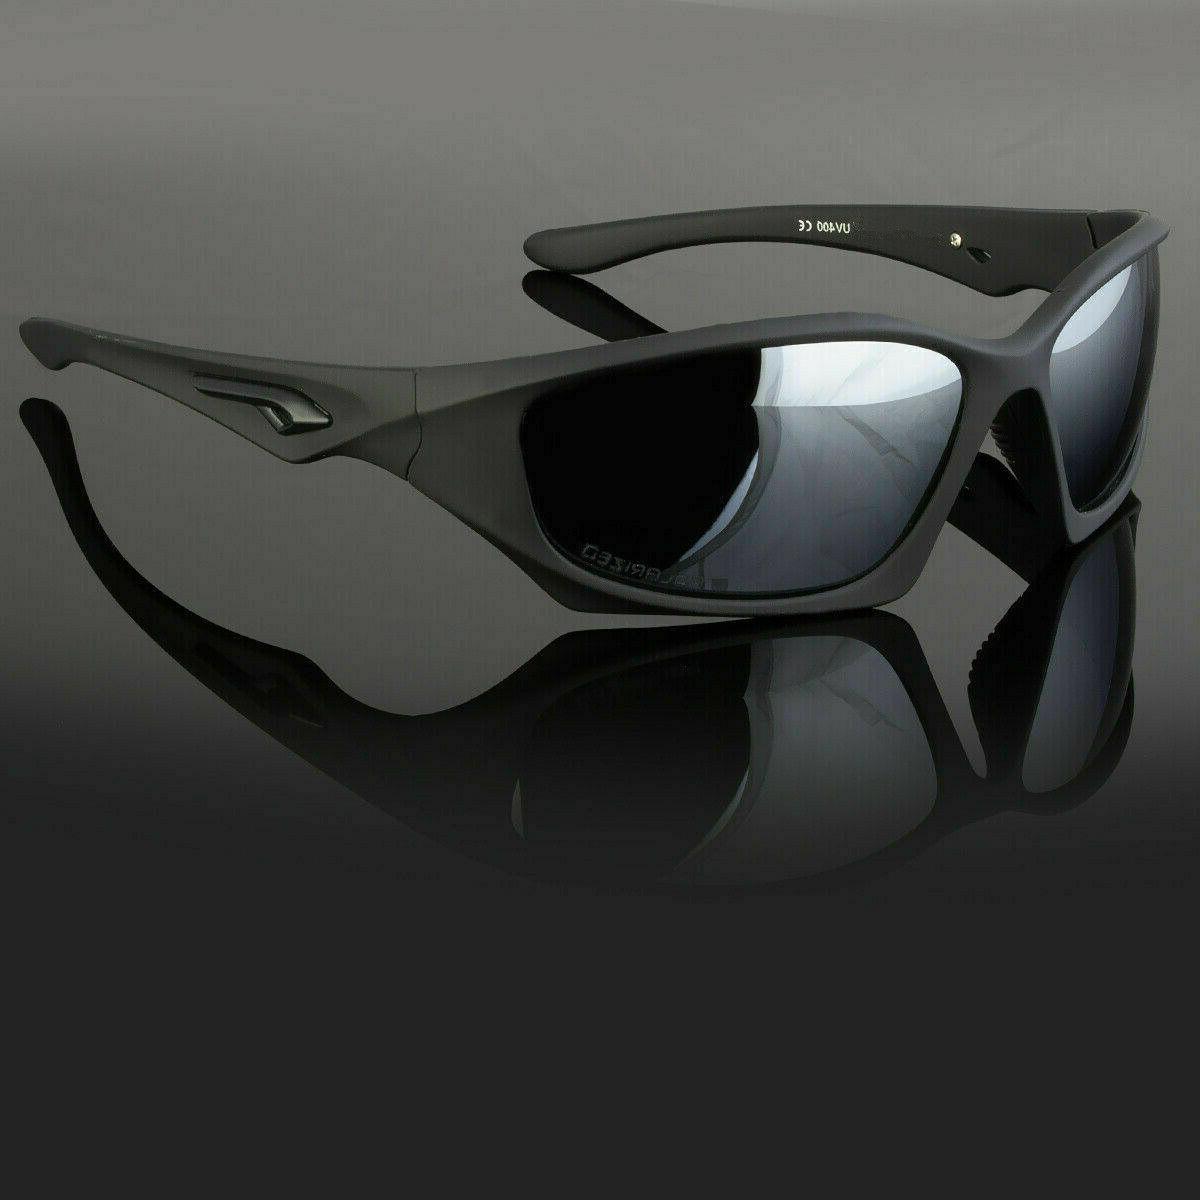 New Polarized Sports Eyewear Sunglasses Around Men Glasses